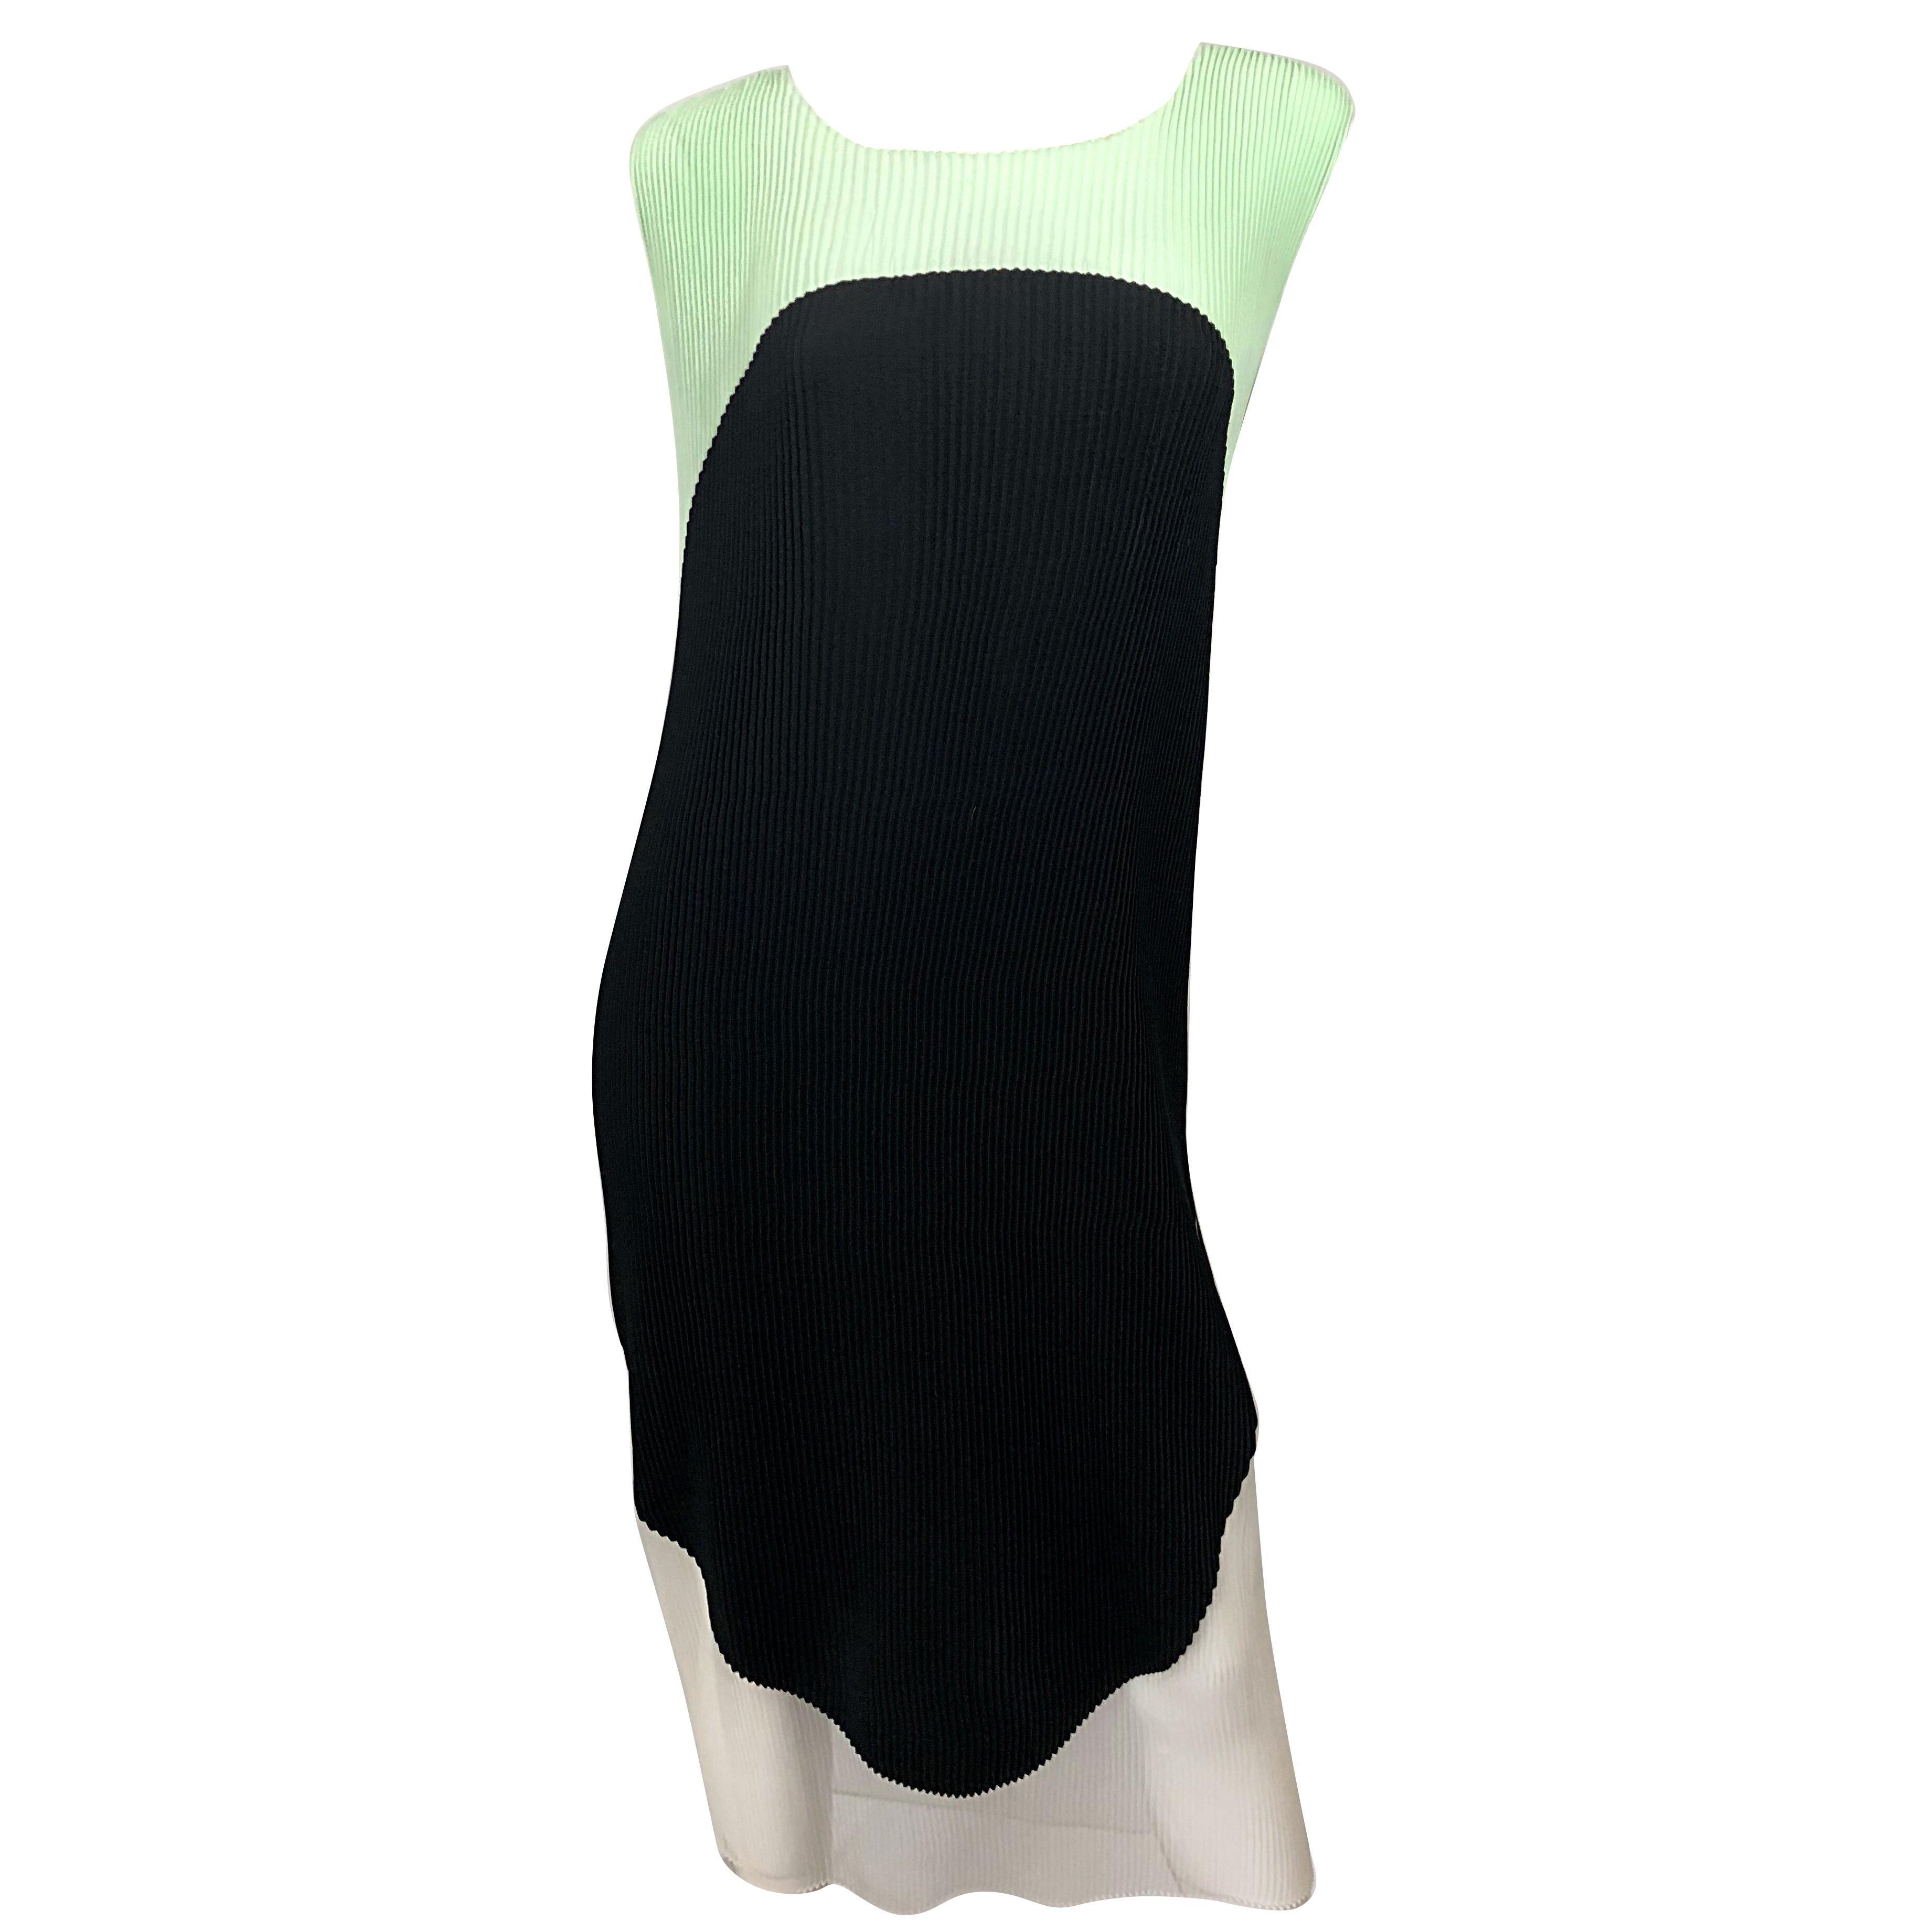 Stella McCartney Spring 2013 Runway Size 44 US 8 - 10 Color Block Pleated Dress